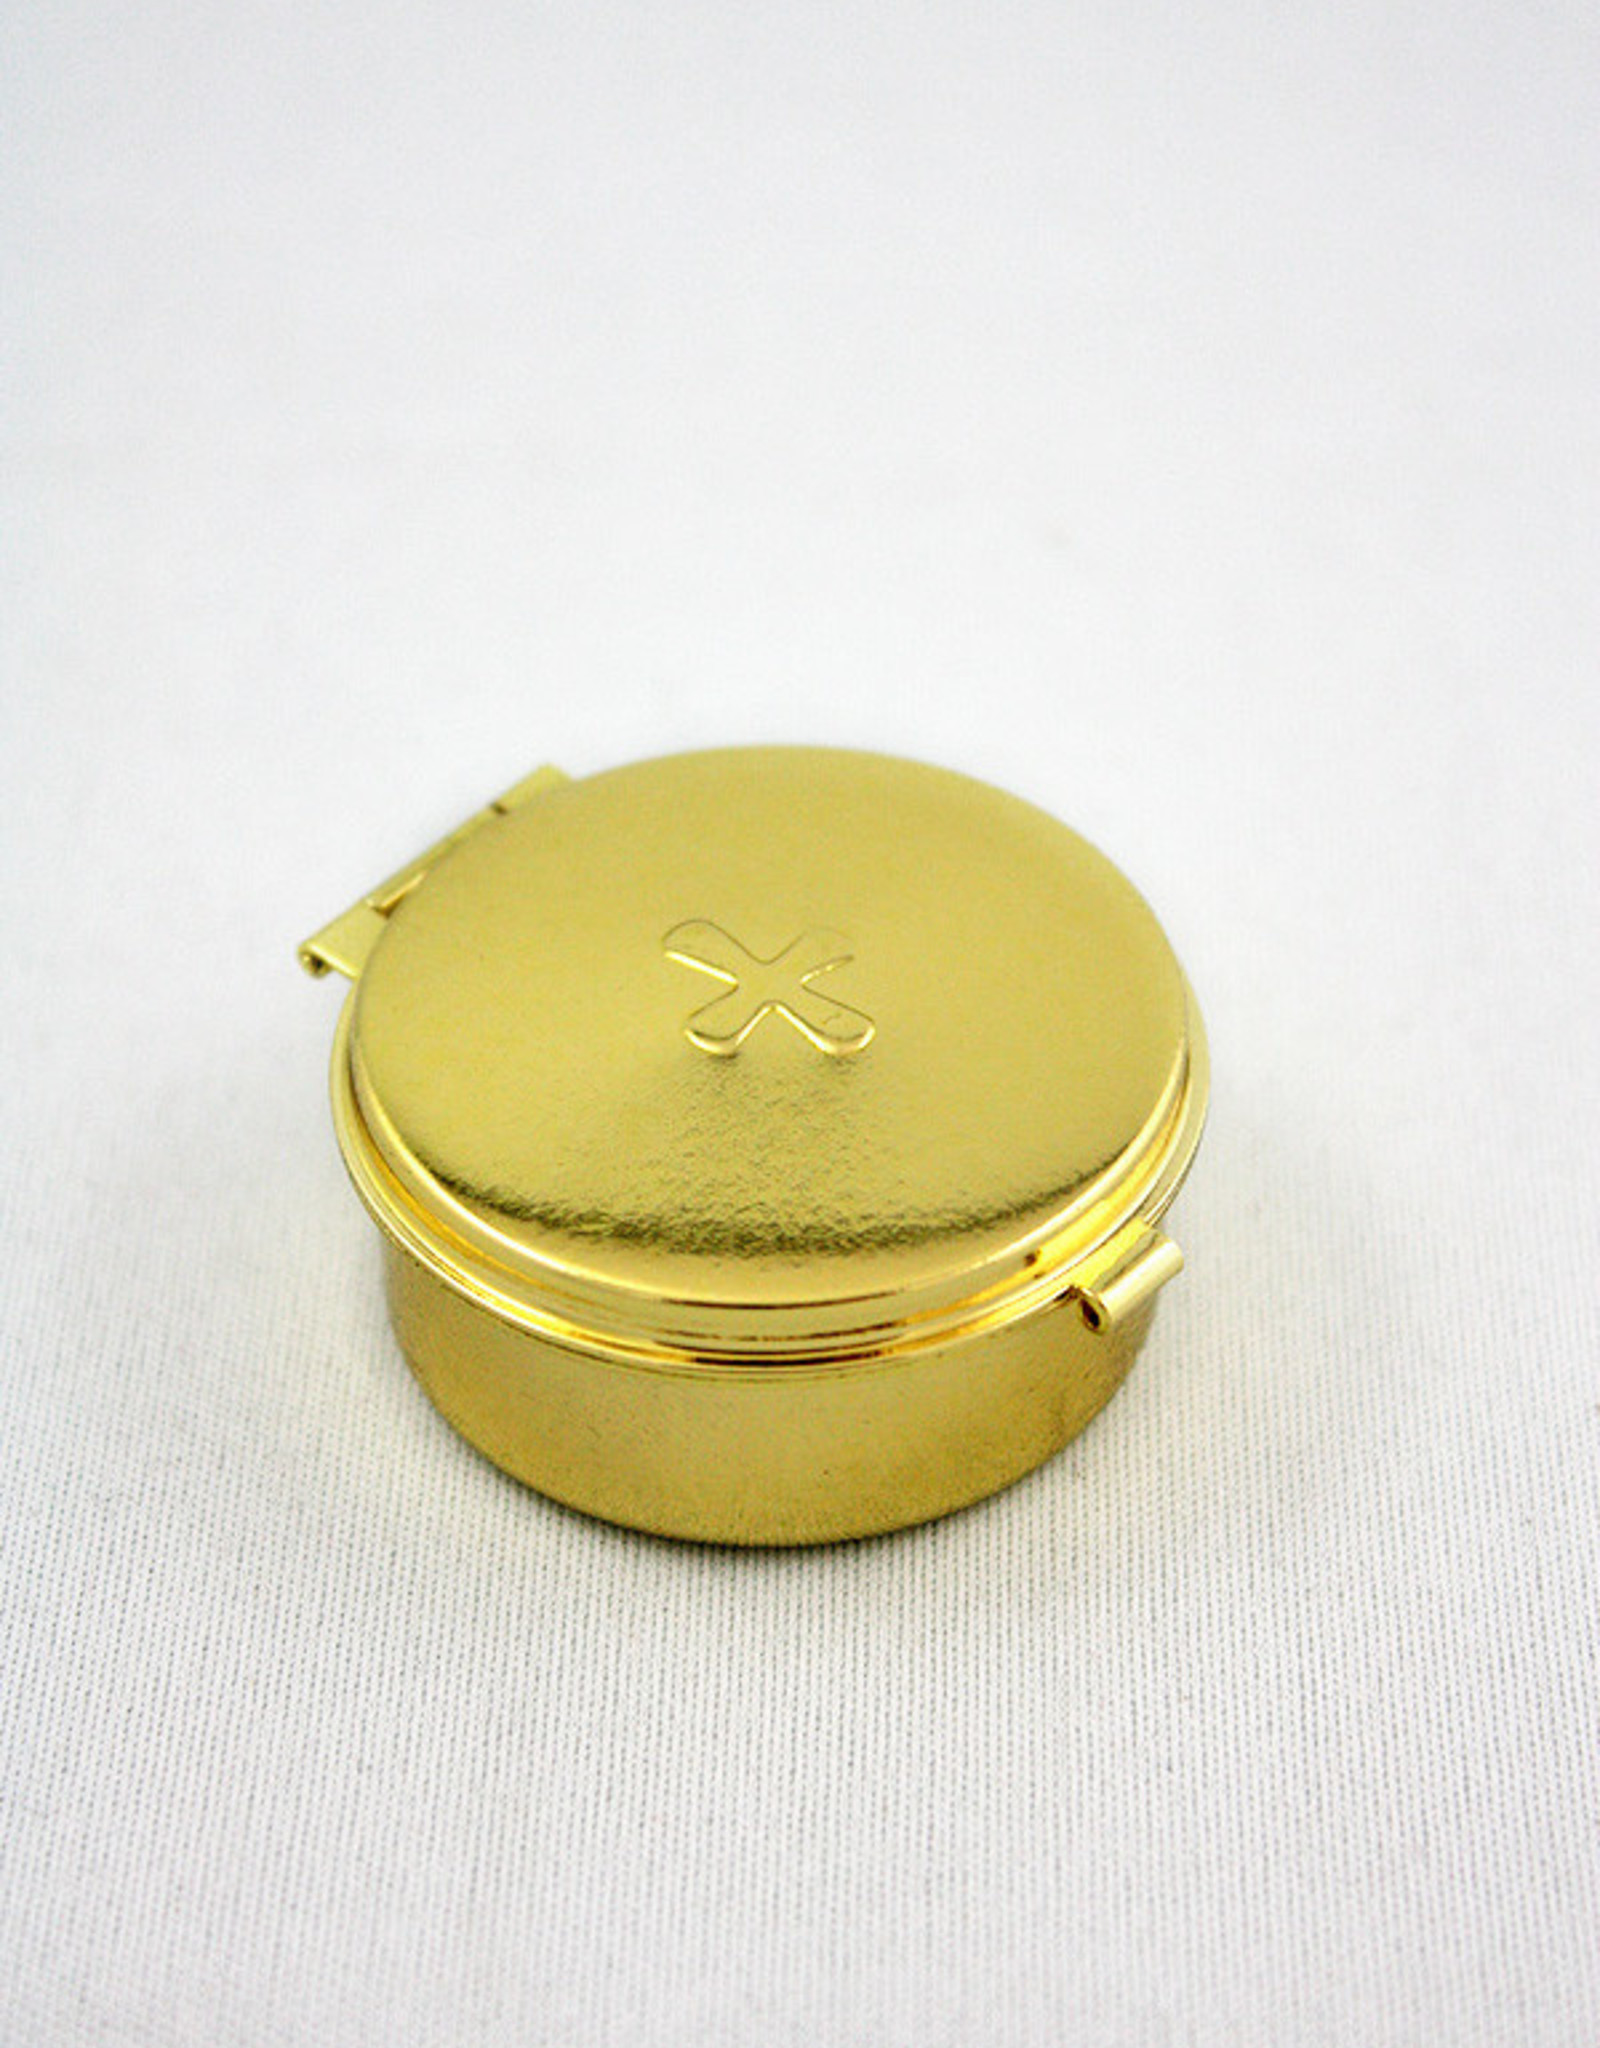 Golden pyx